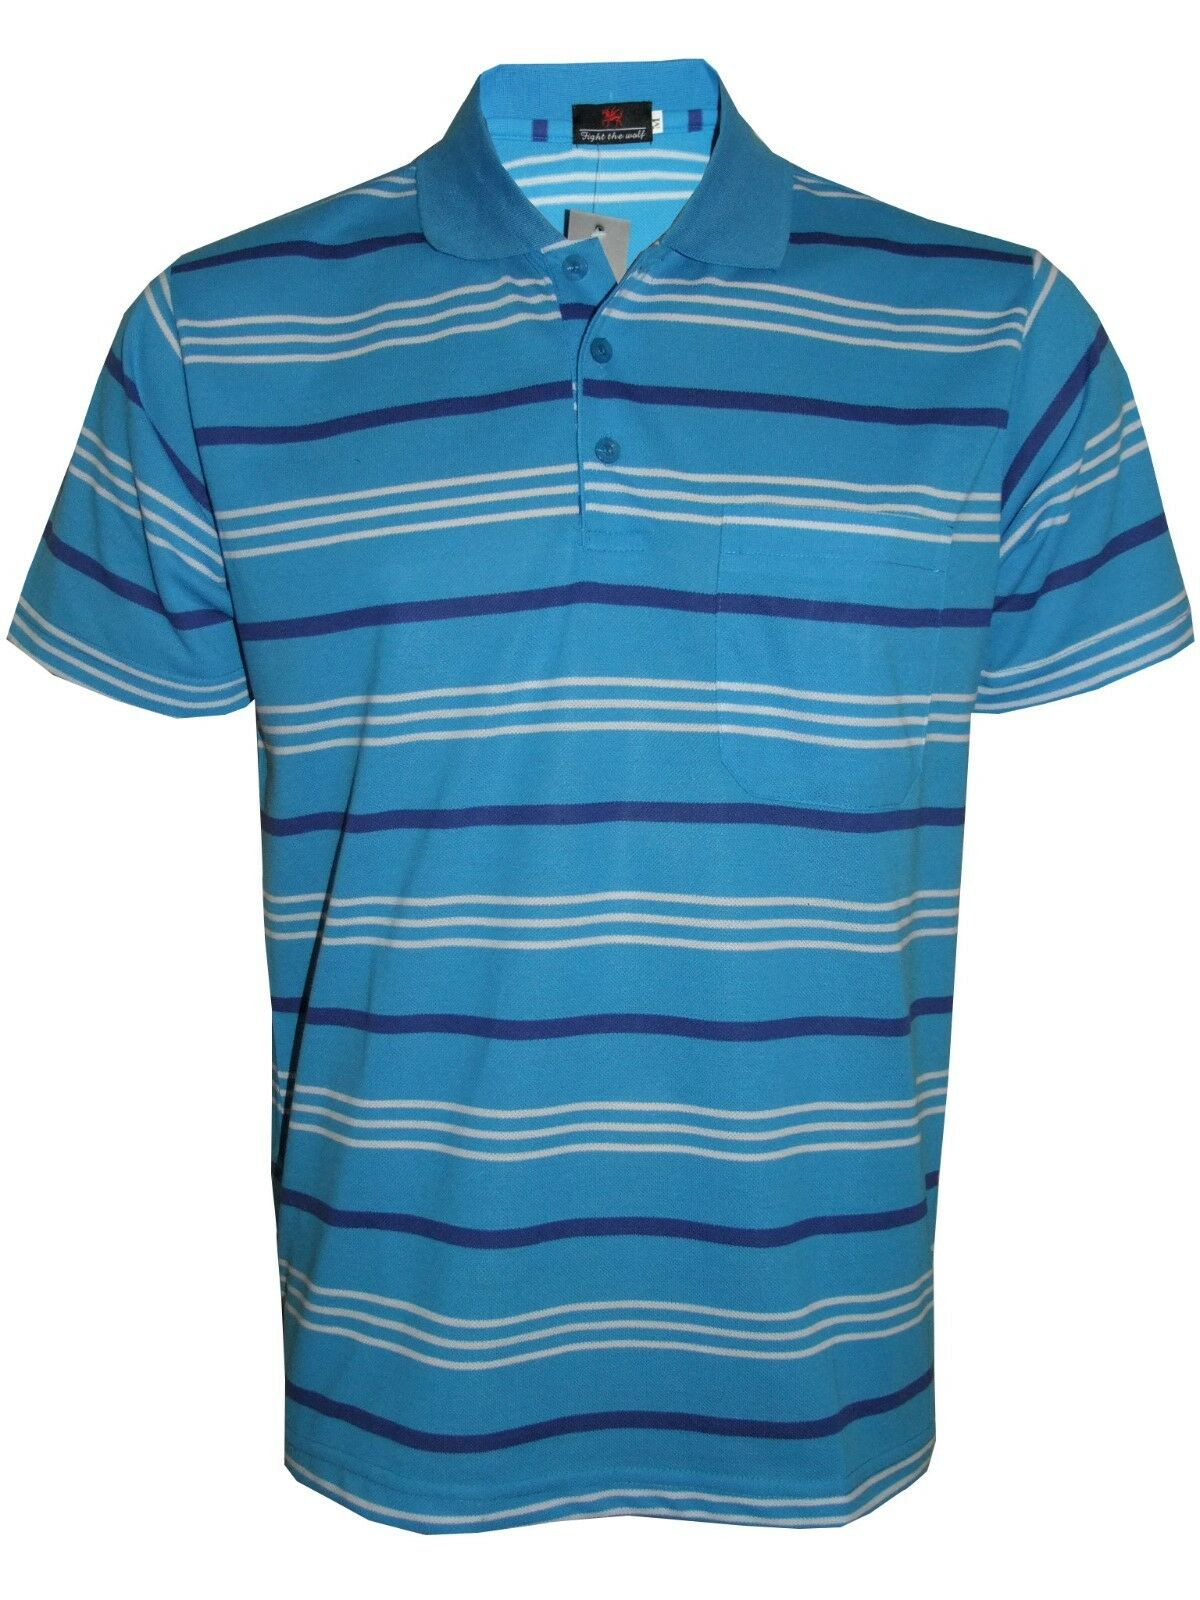 Men's Striped T-Shirts Regular Fit Pique Polo PolyCotton Tops Casual Shirt M-3XL